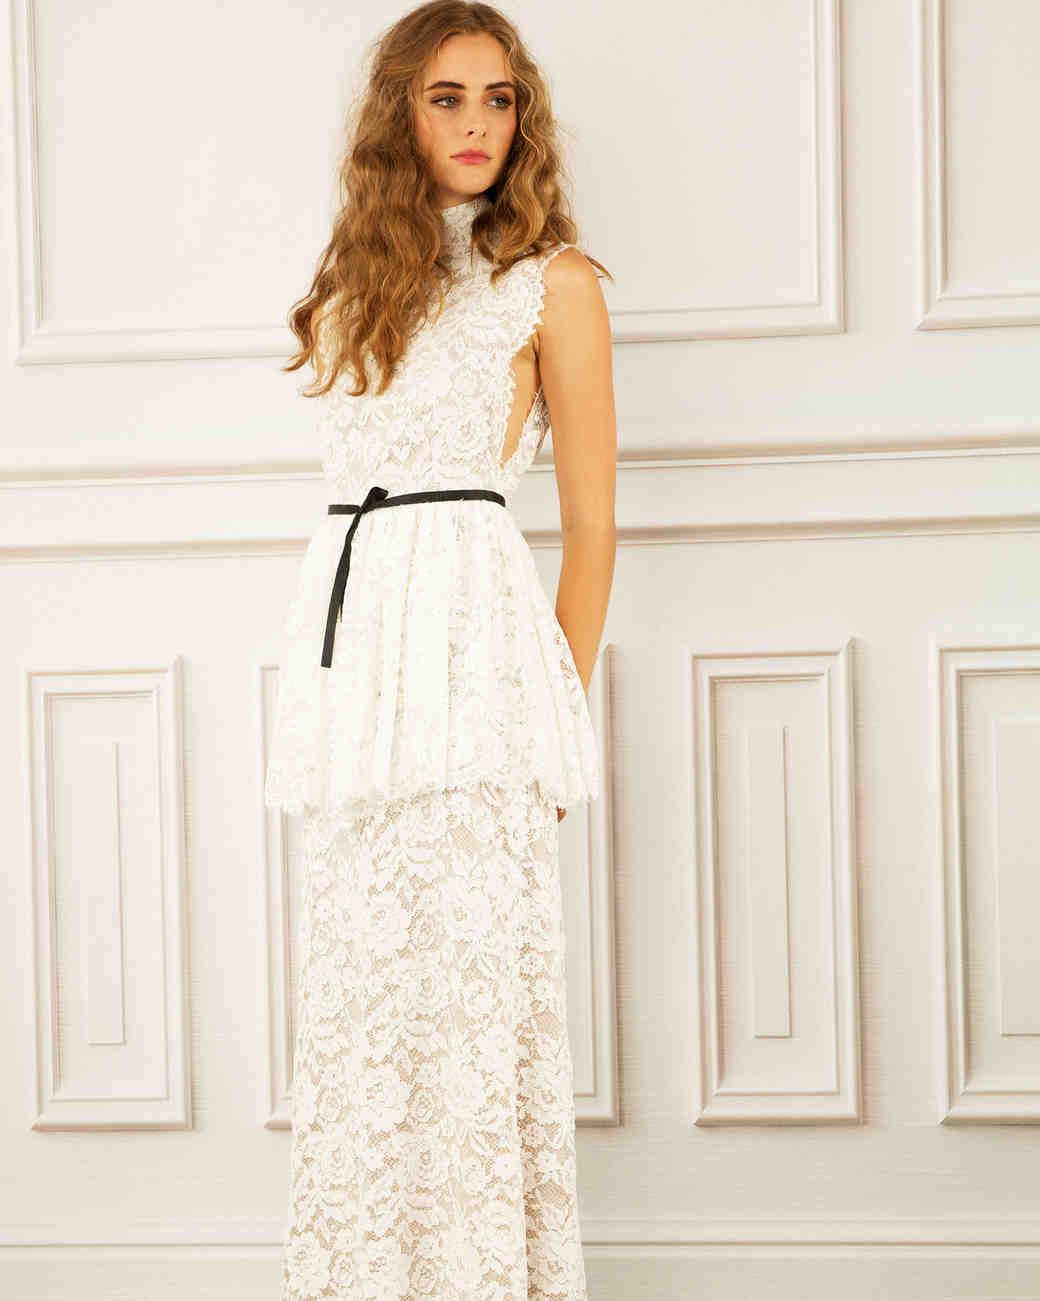 maria korovilas wedding dress spring 2017 lace black belt